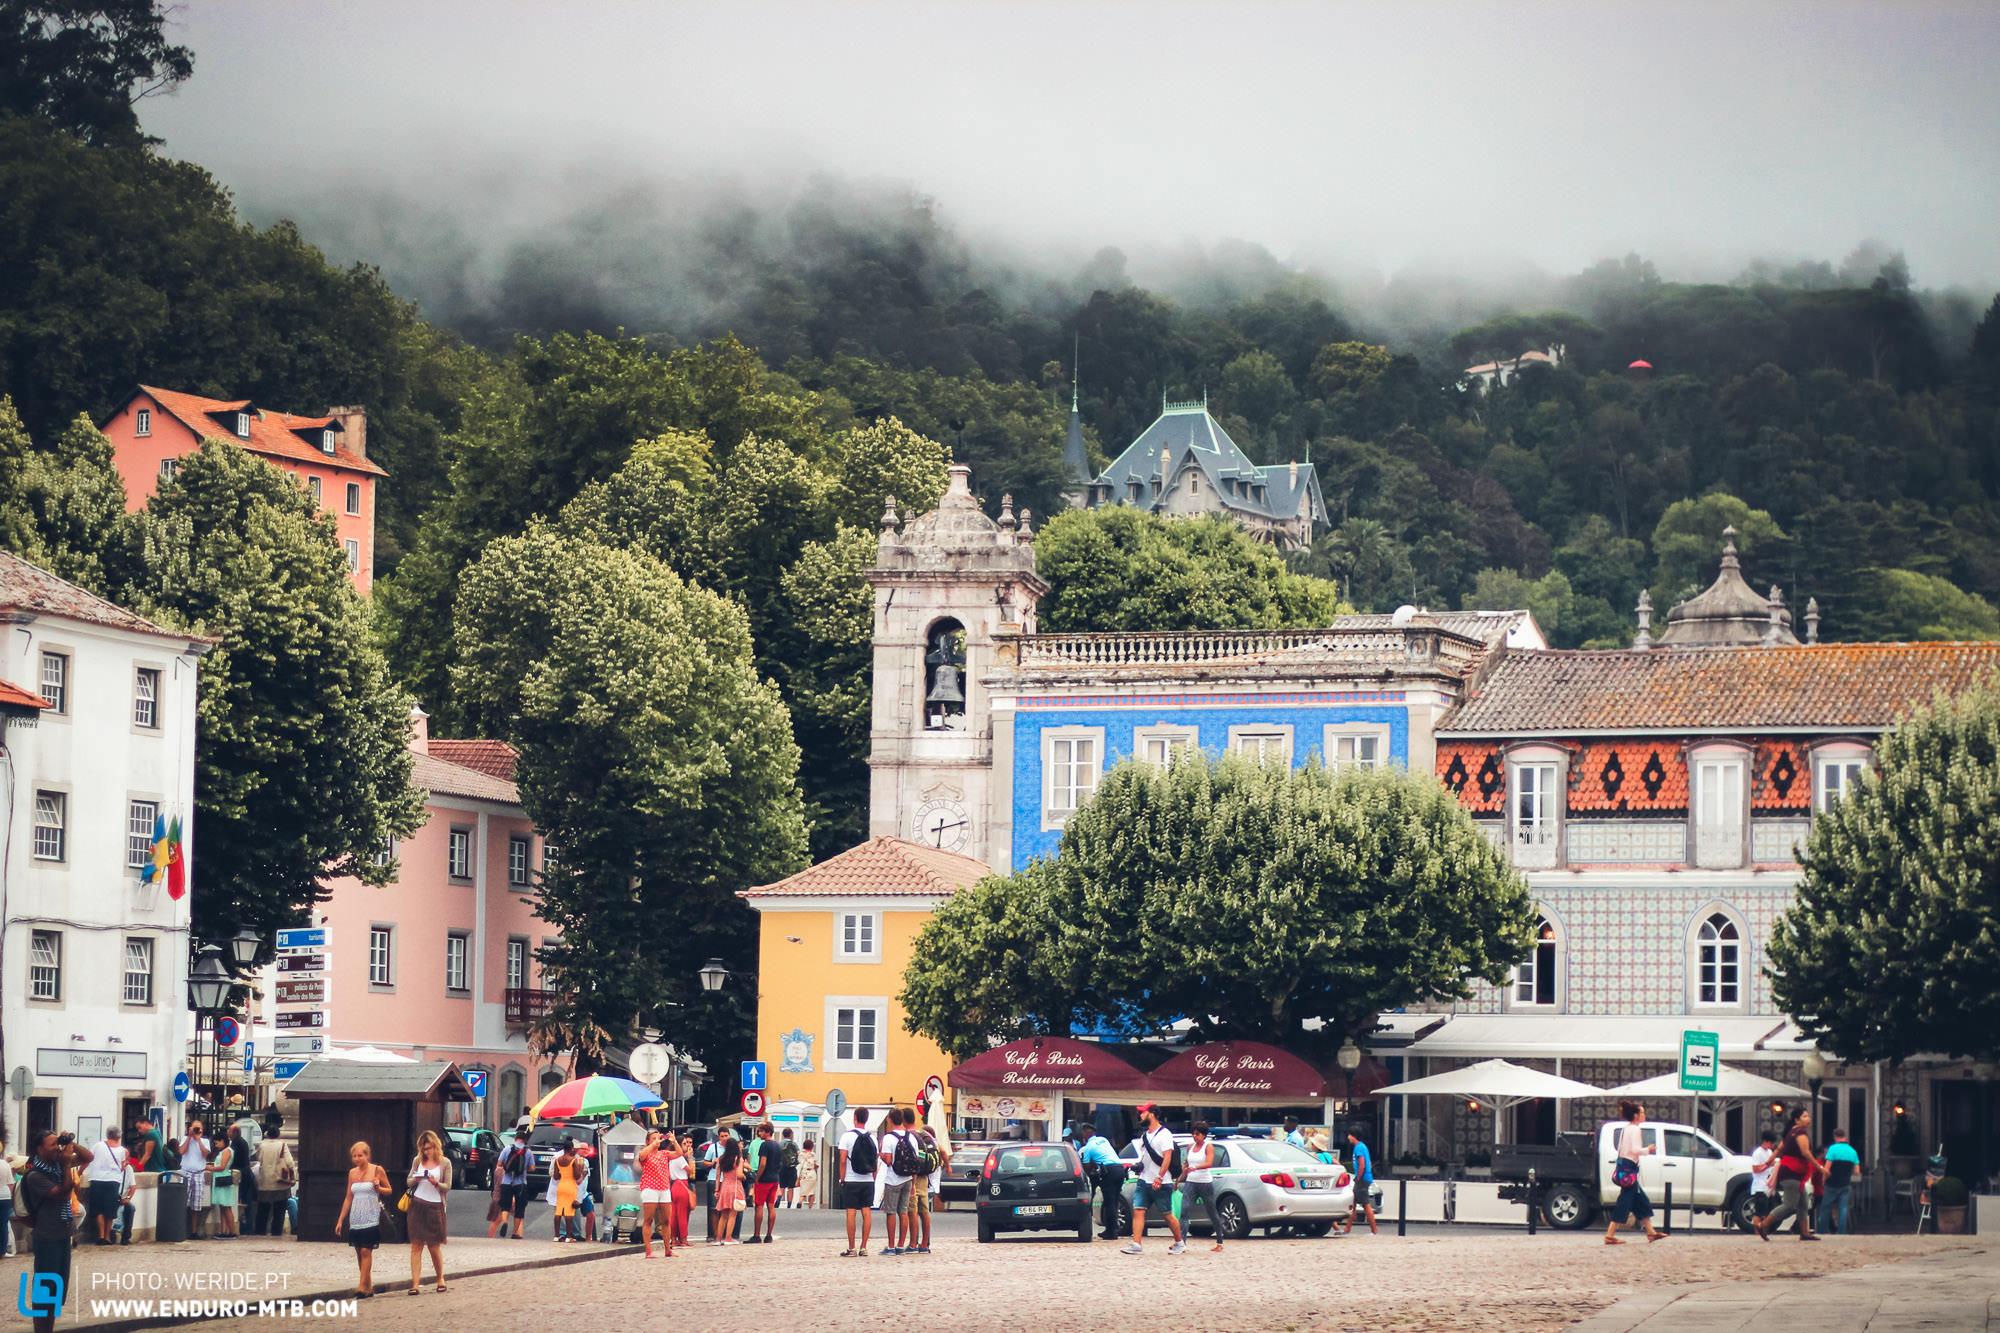 Travel-Story-Portugal-Sintra-3.jpg